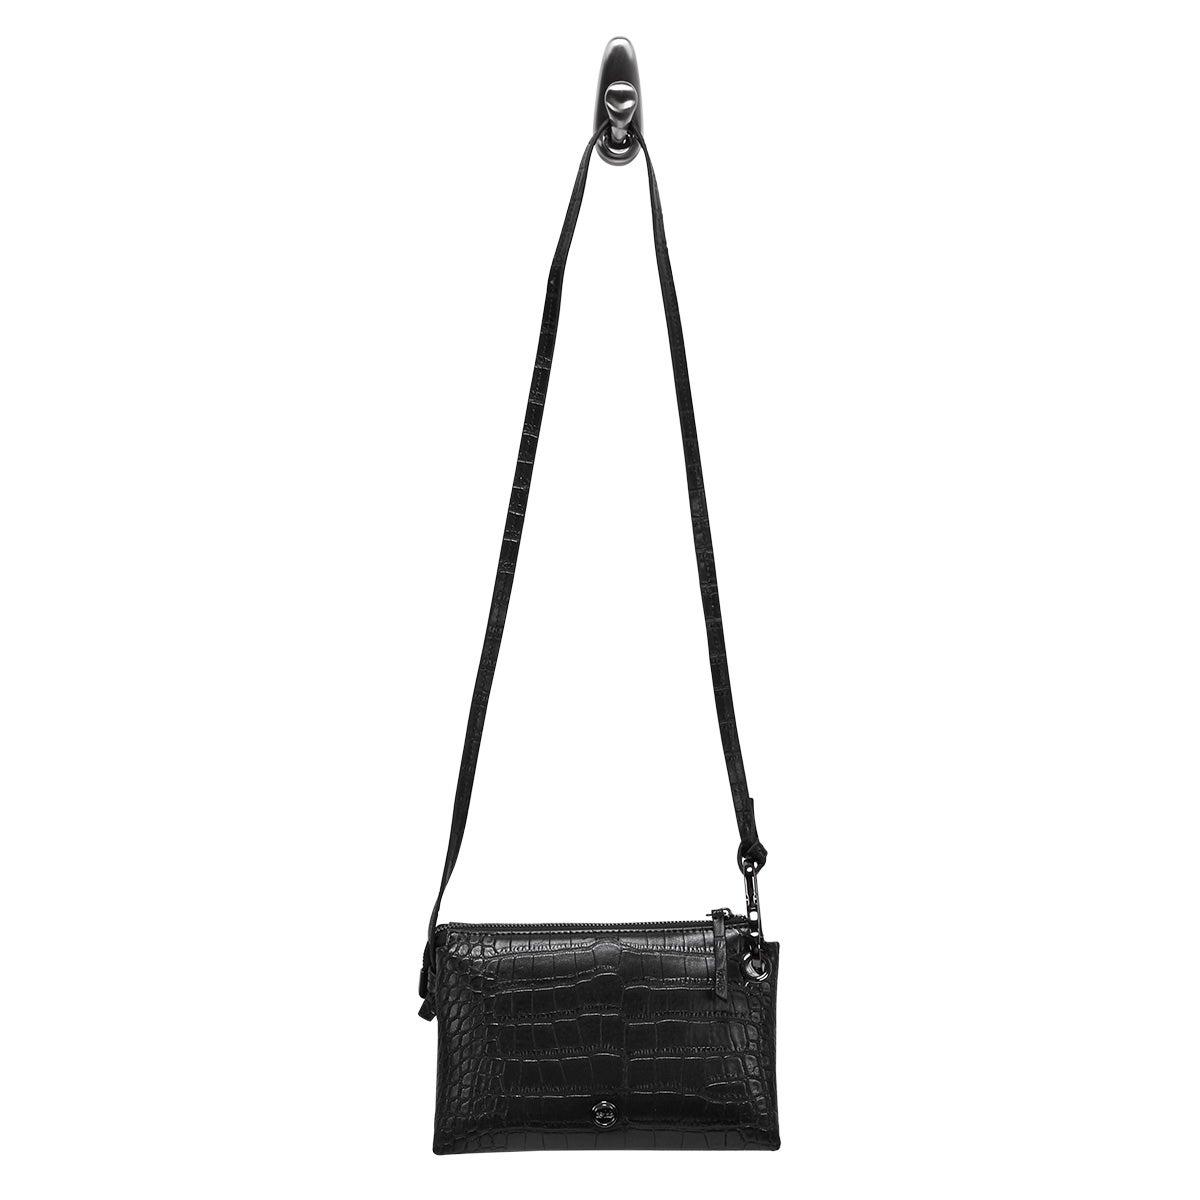 Lds black croco mini cross body bag